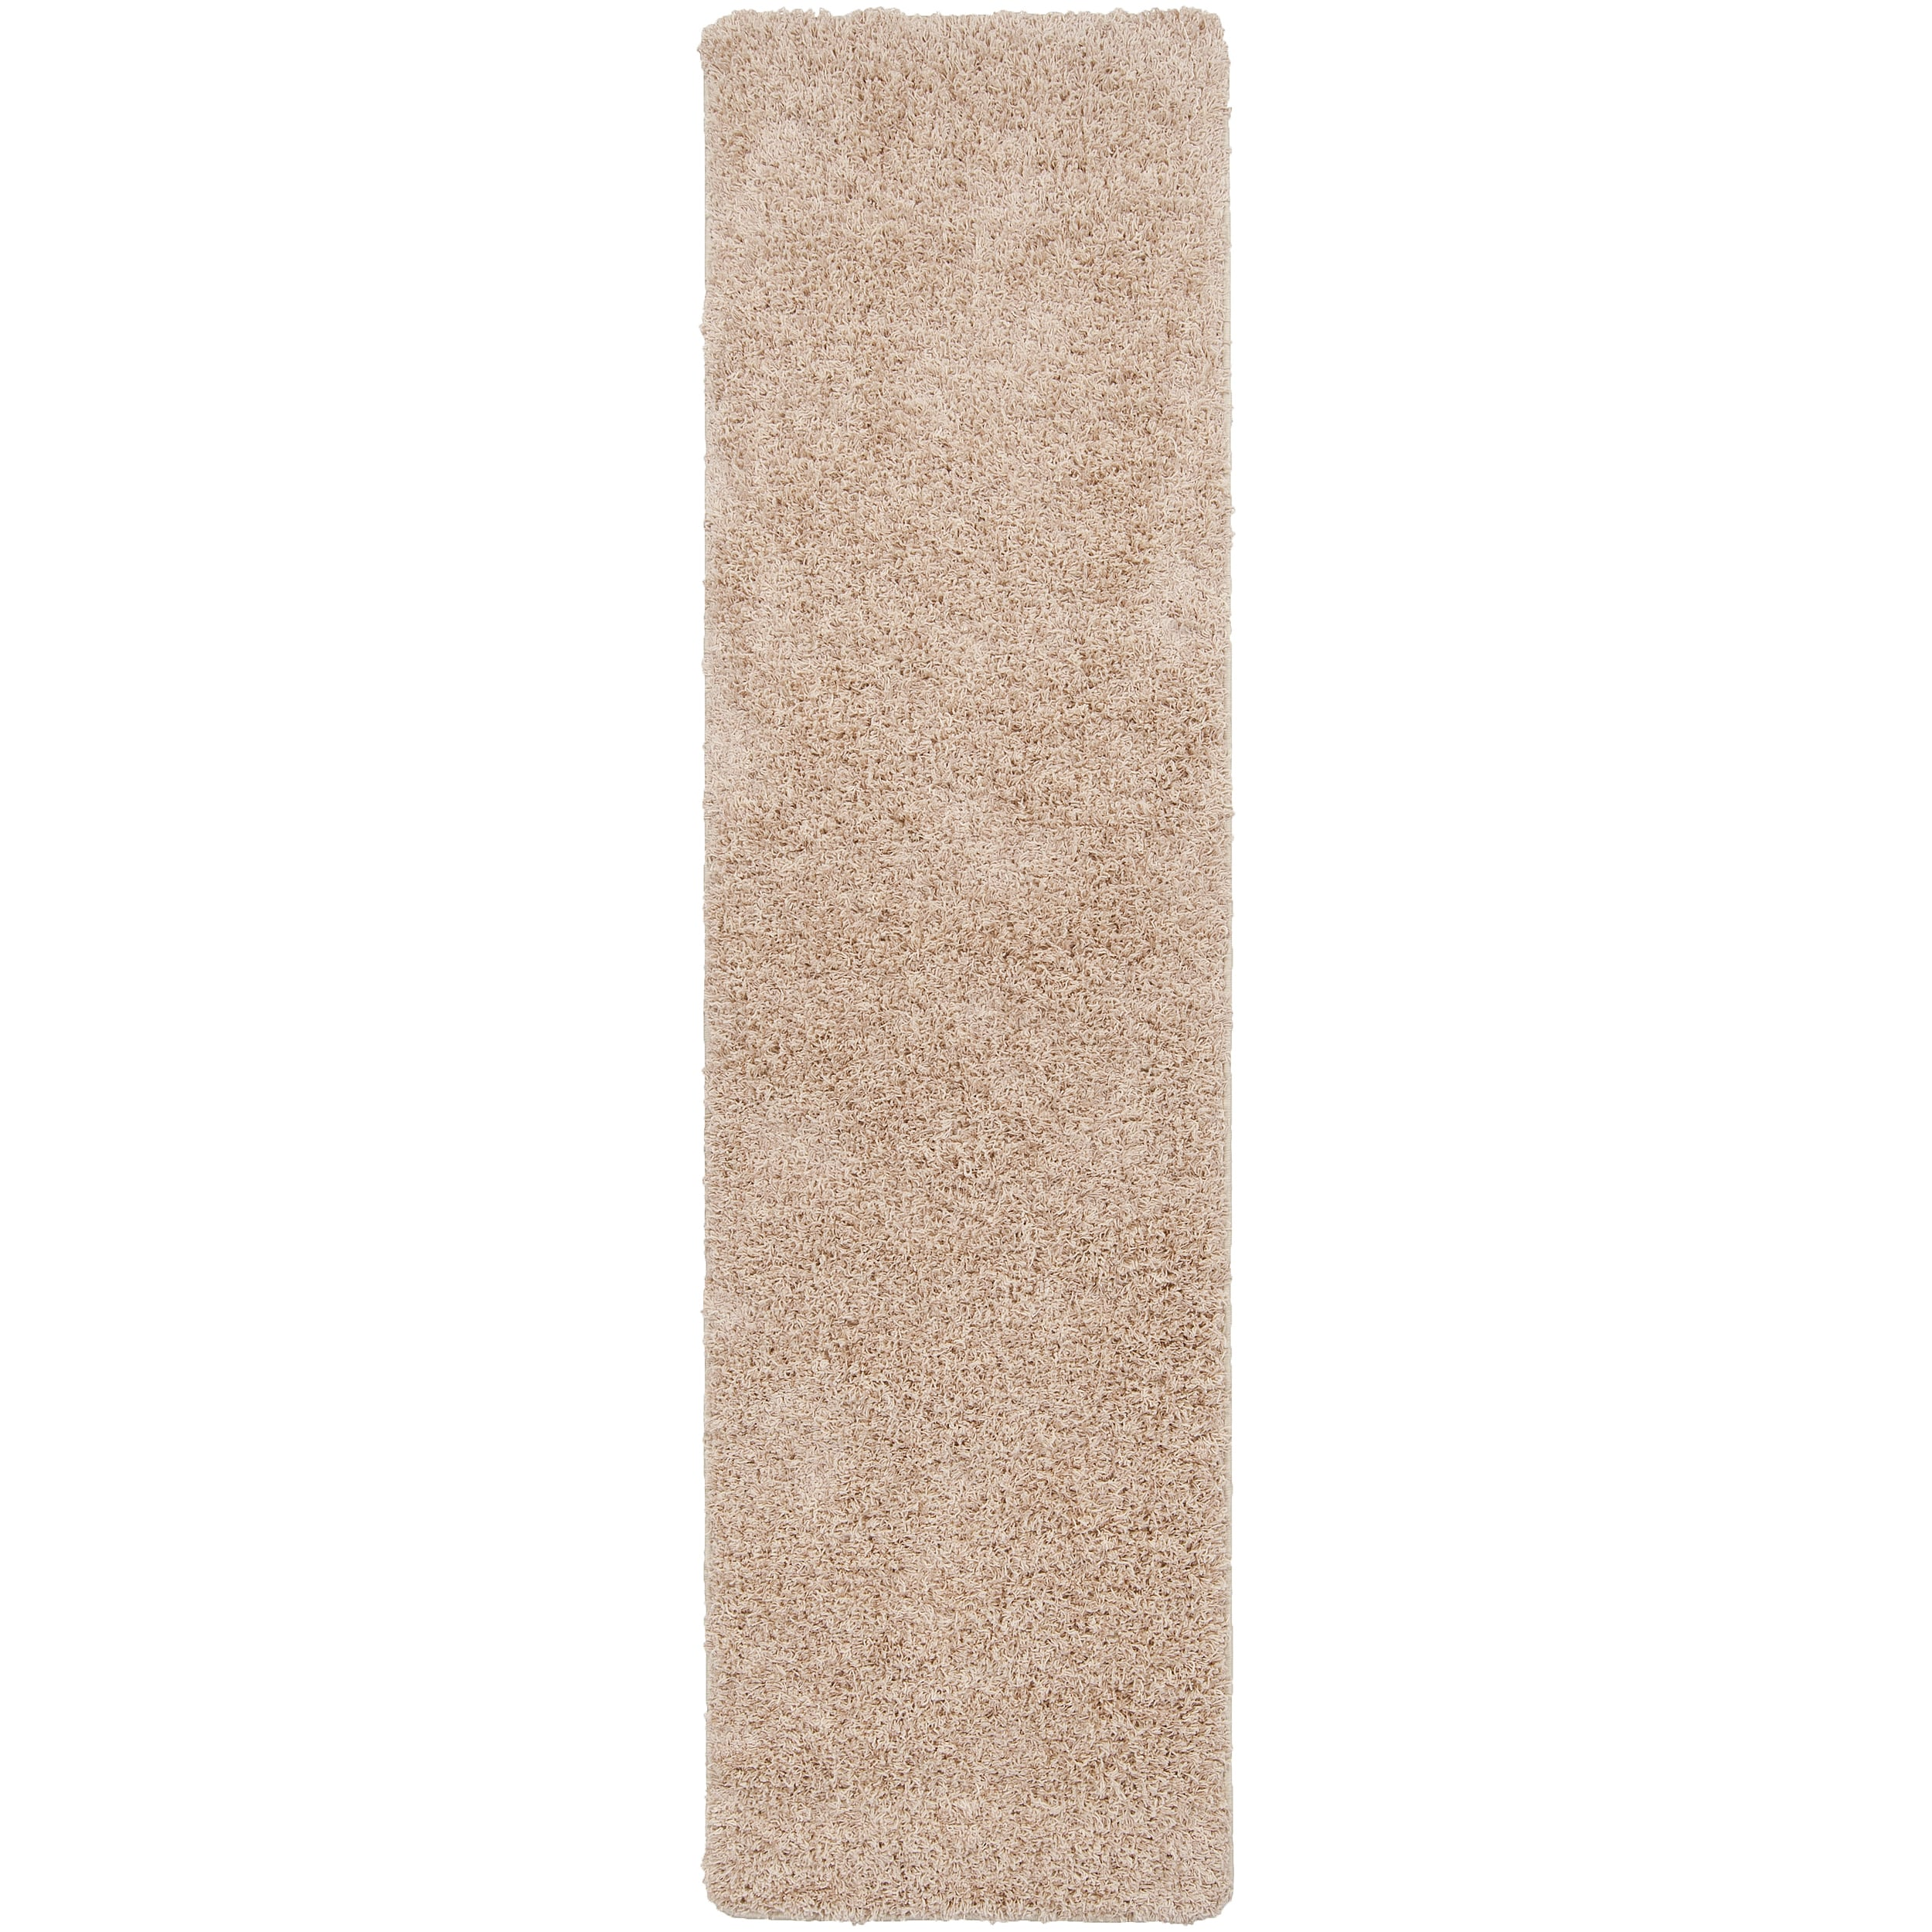 Woven Beige Calucy Plush Shag (2'3 x 8')